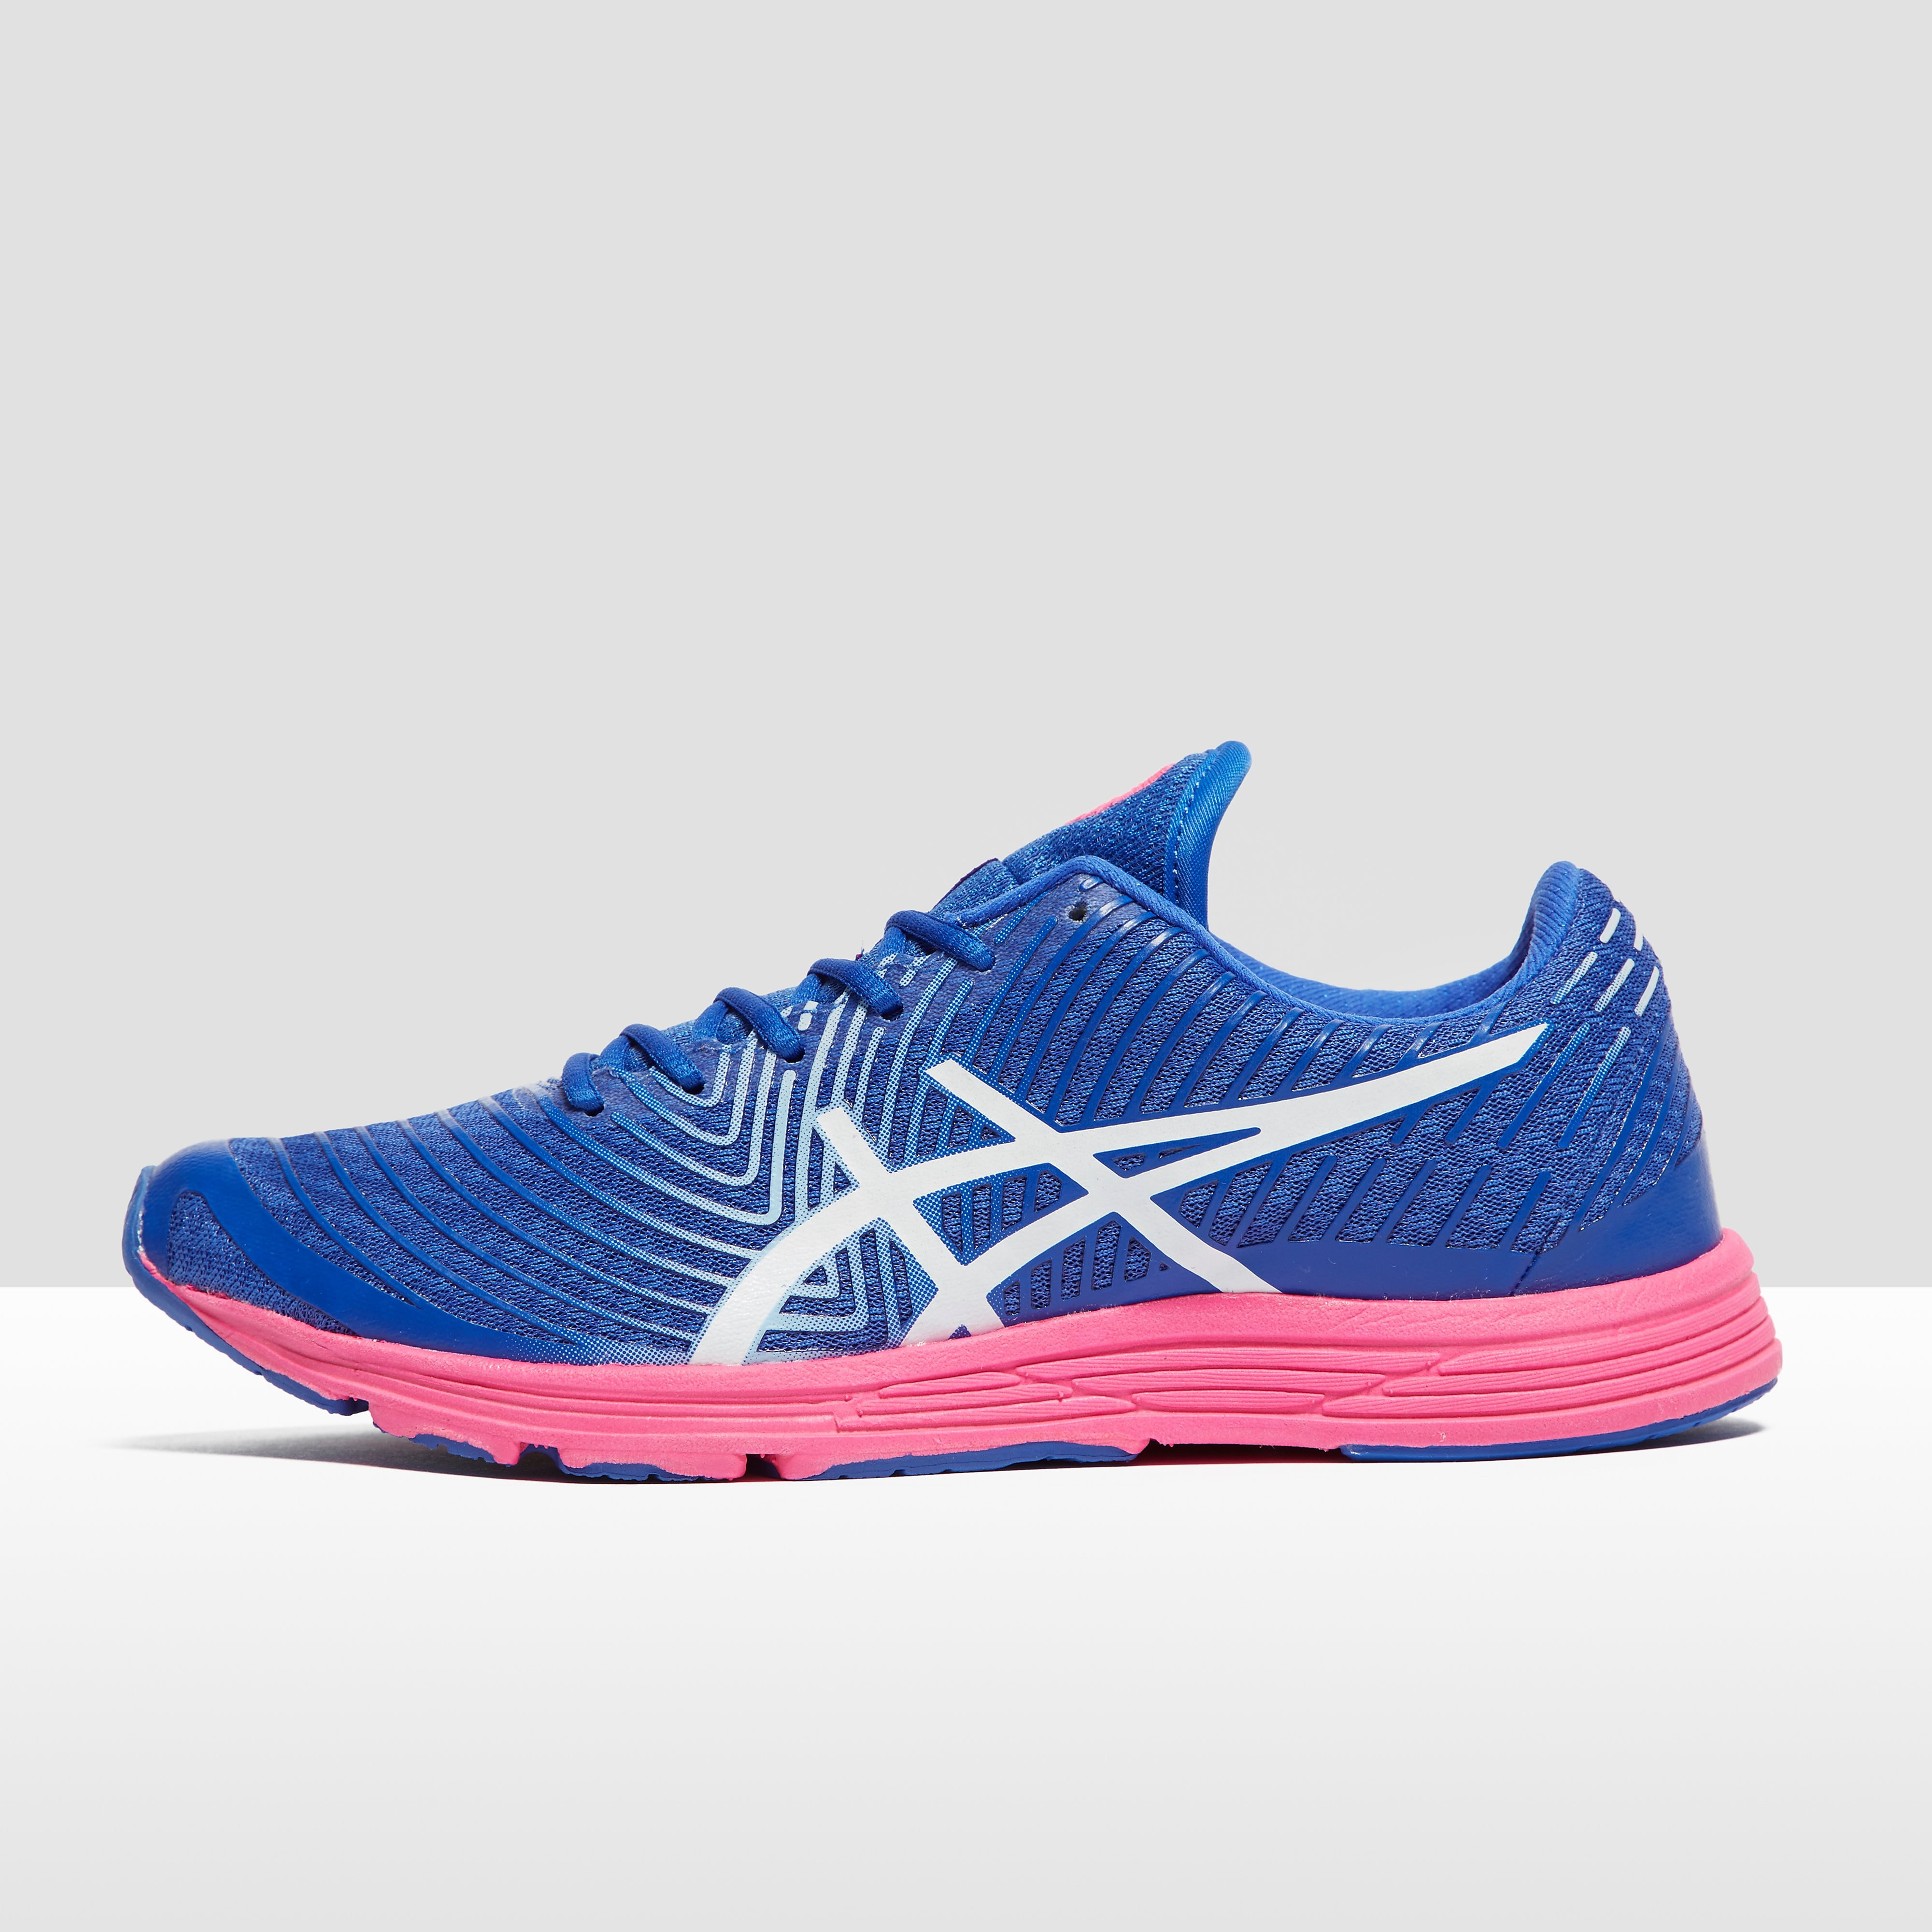 ASICS GEL-Hyper Tri 3 Women's Training Shoes